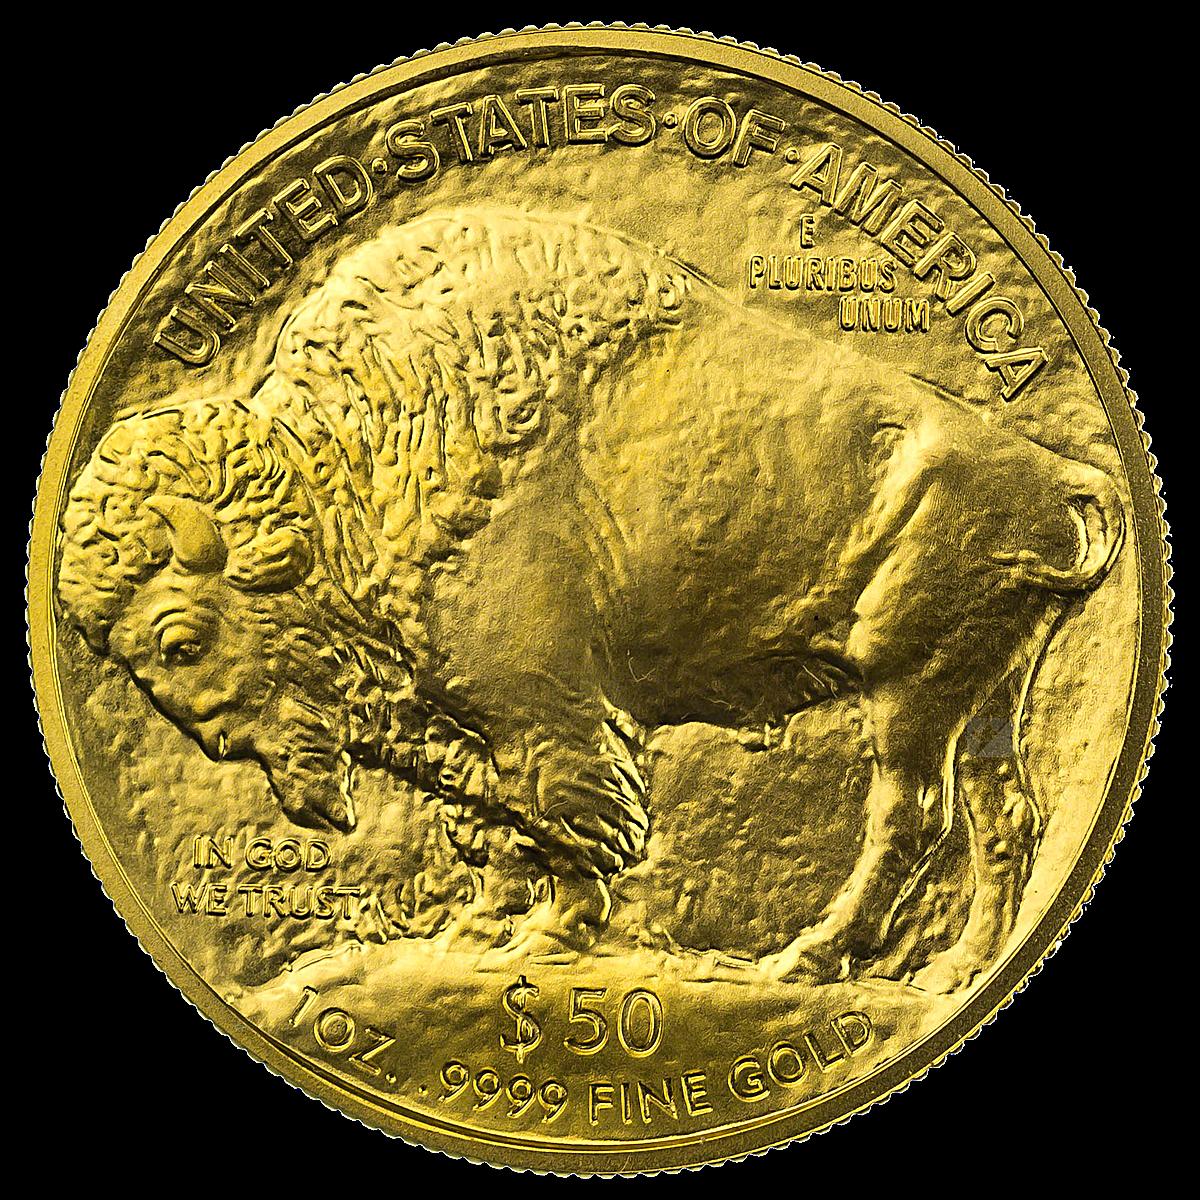 American Gold Buffalo 2013 1 Oz Bullionstar Singapore